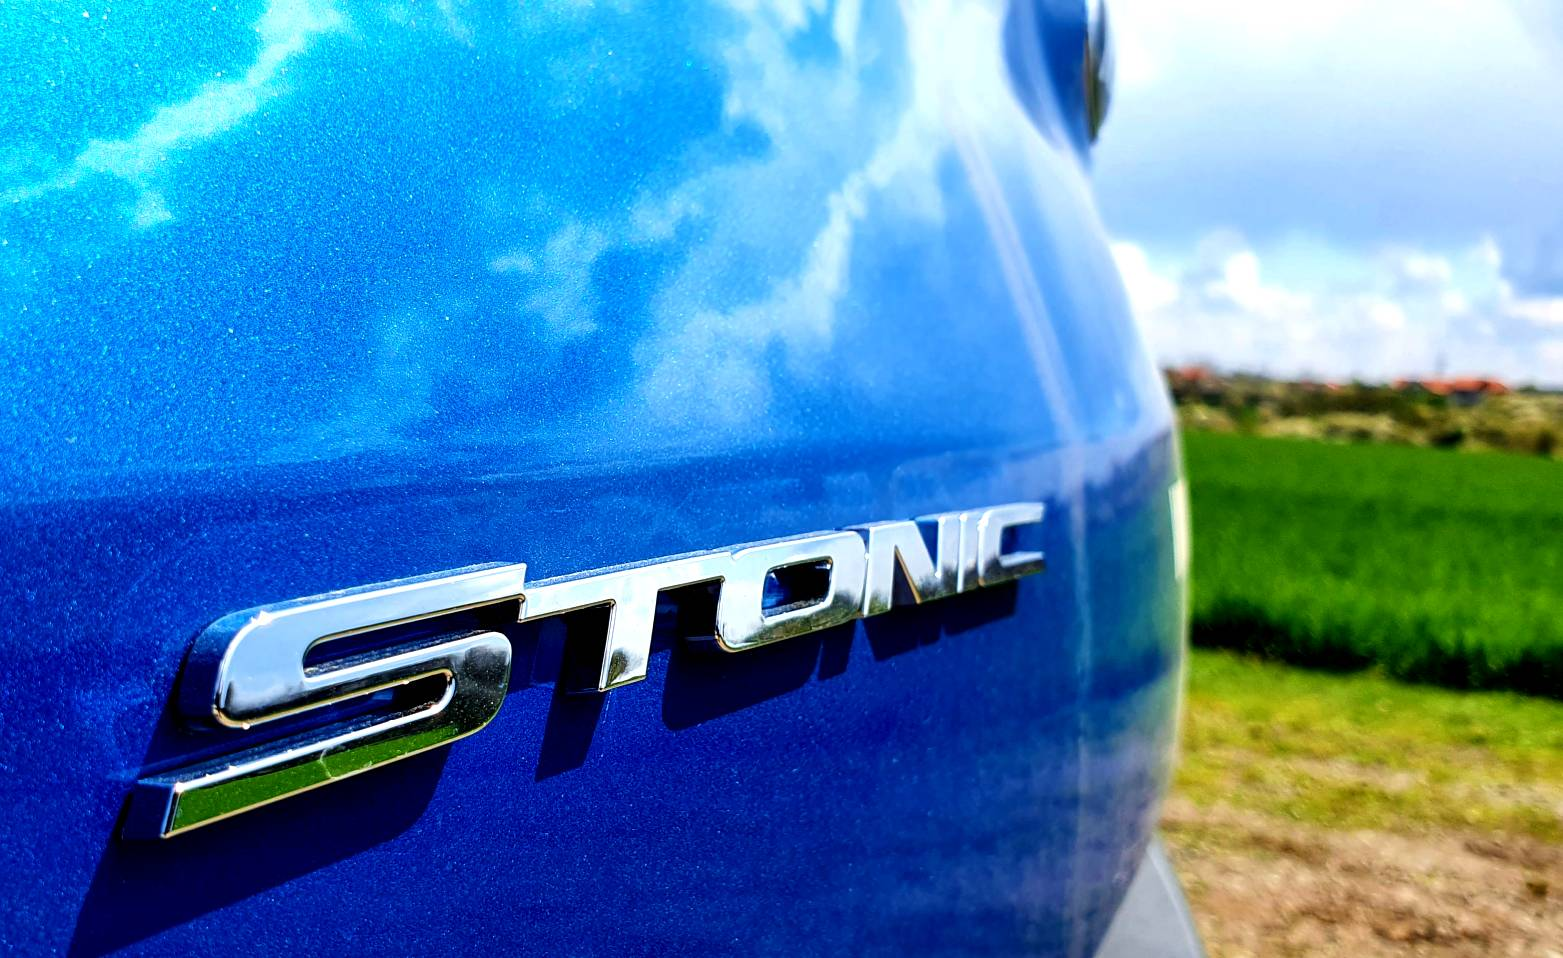 kia stonic 1.0 T-GDI 7DCT HP Hybrid Electric GT Line, test drive kia stonic 1.0 T-GDI 7DCT HP Hybrid Electric GT Line, review kia stonic 1.0 T-GDI 7DCT HP Hybrid Electric GT Line, test romania, autolatest, pret kia stonic 1.0 T-GDI 7DCT HP Hybrid Electric GT Line, consum kia stonic